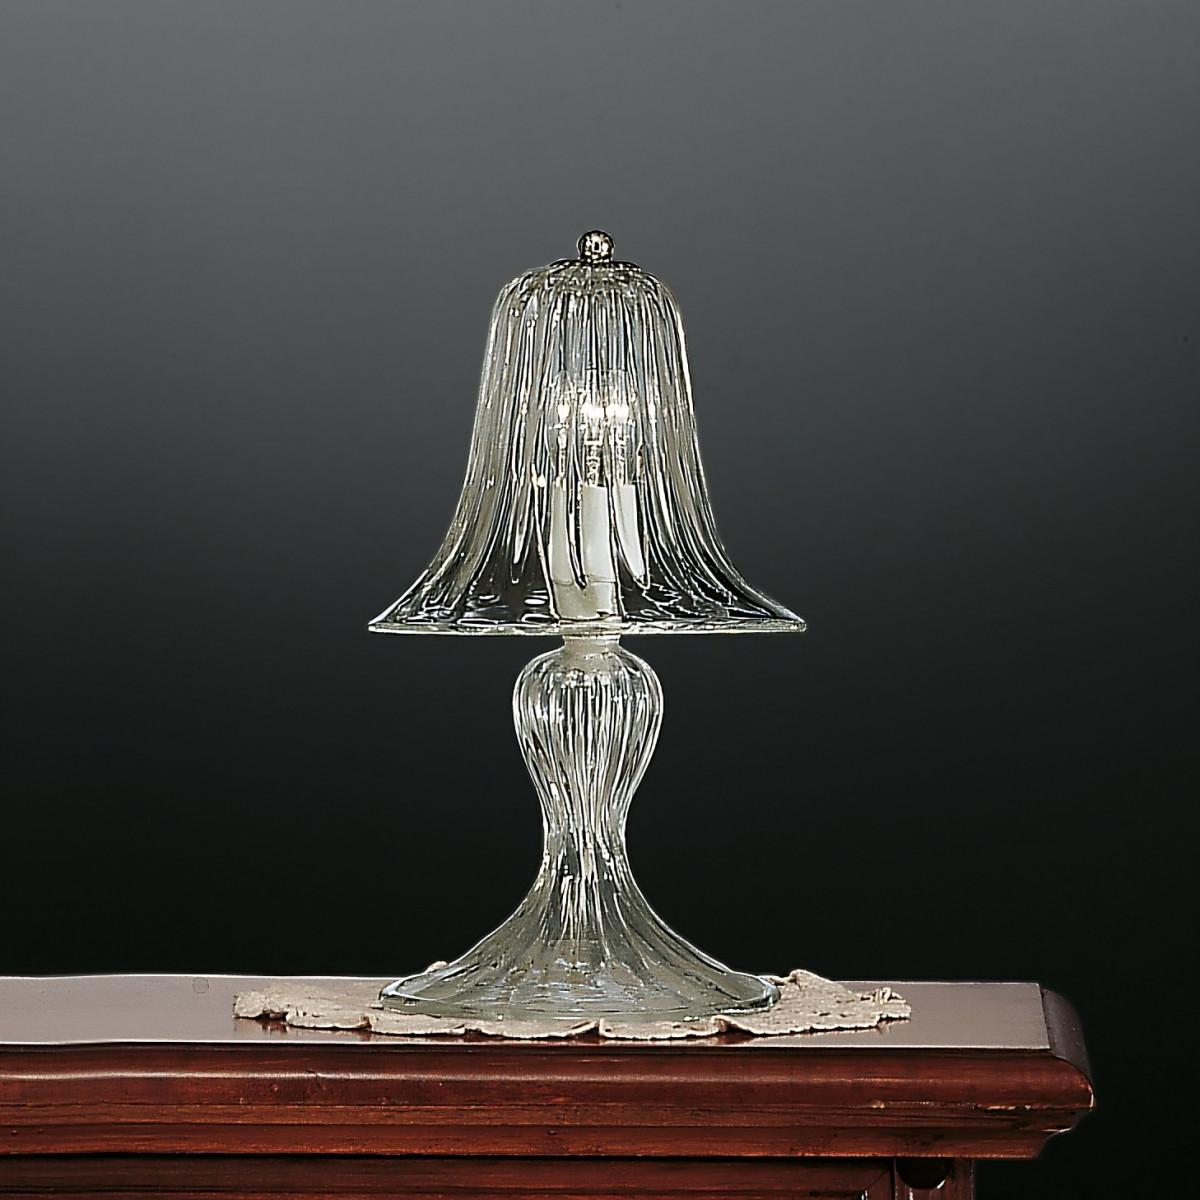 Rialto 1 luz pequeña lámpara de mesa de Murano - color transparente